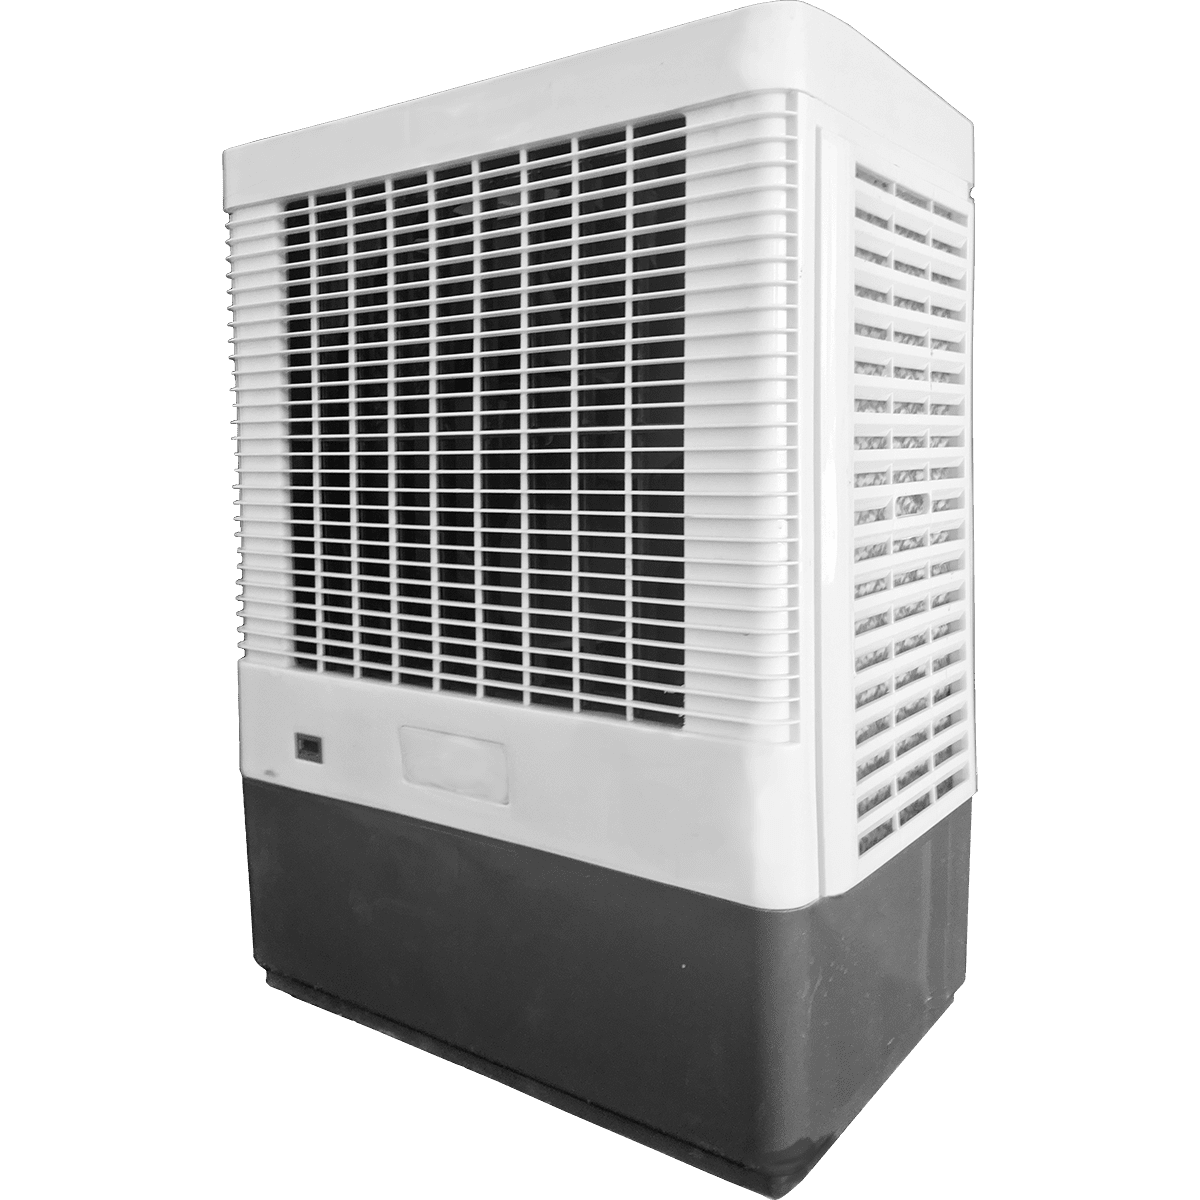 Arizona Kuul Kube AZ65MA Industrial Mobile Evaporative Cooler az6136